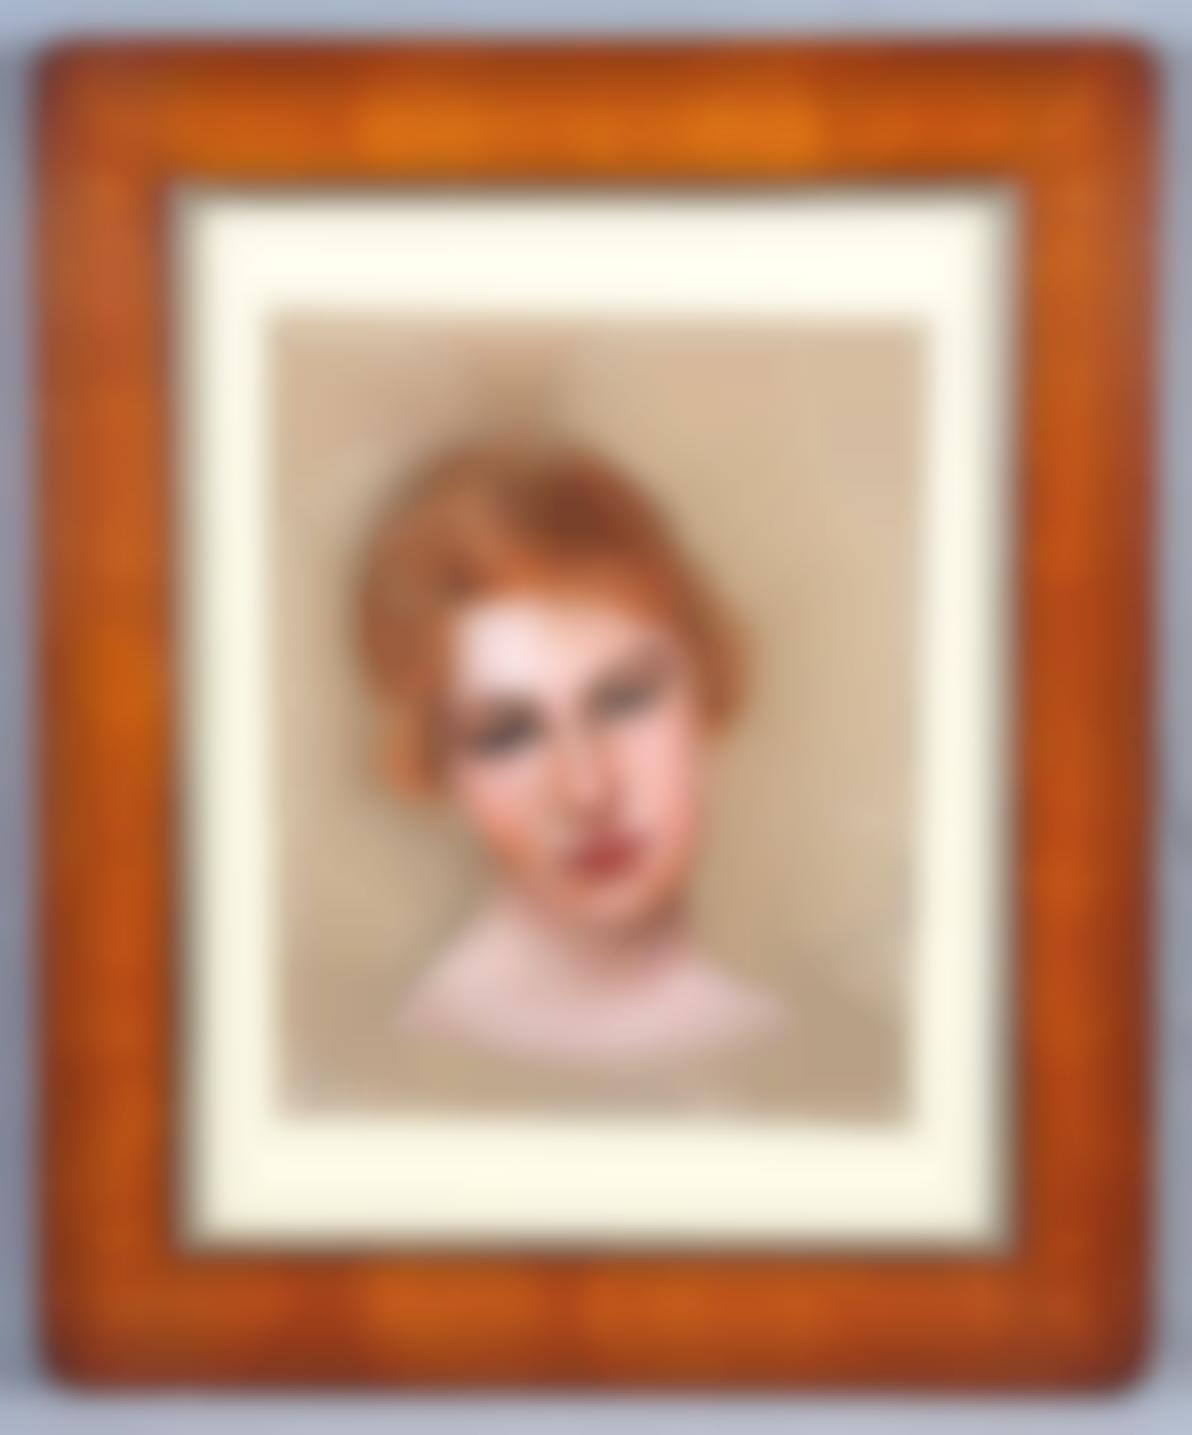 Pena Munoz, Maximino - Portrait-